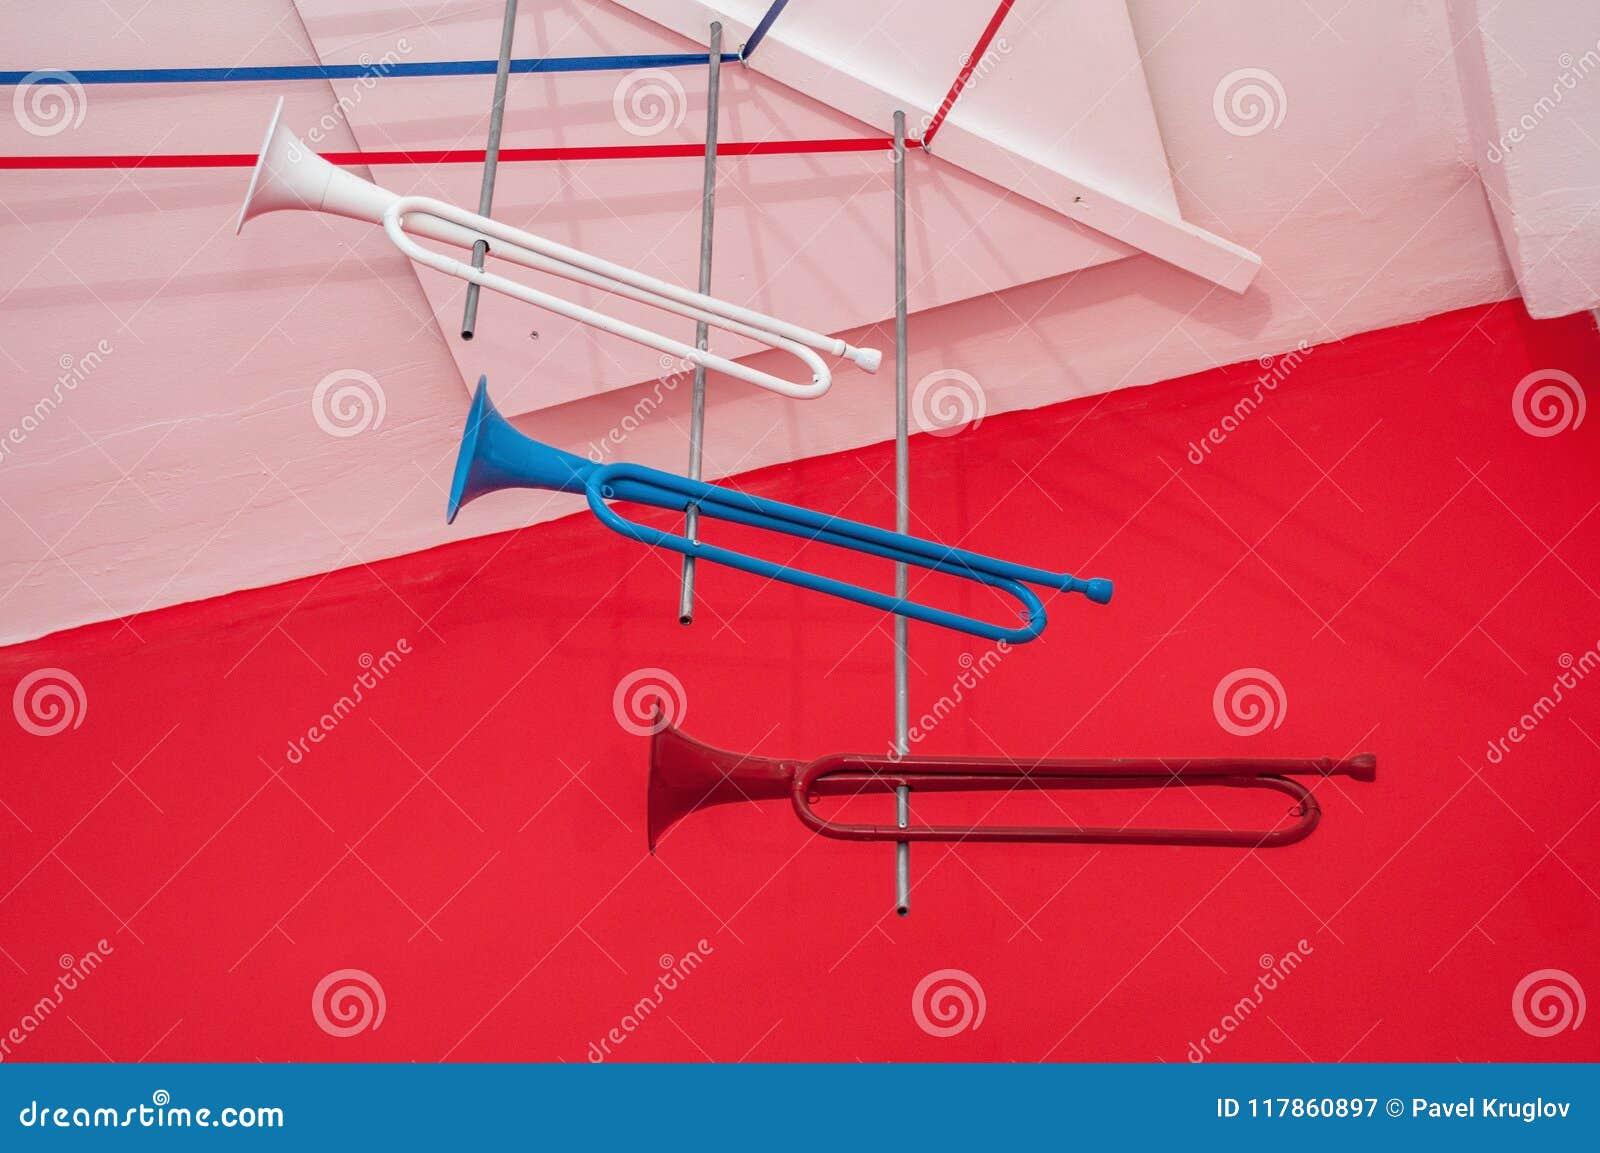 Drie heldere oude trompetten van rode, witte en blauwe kleur